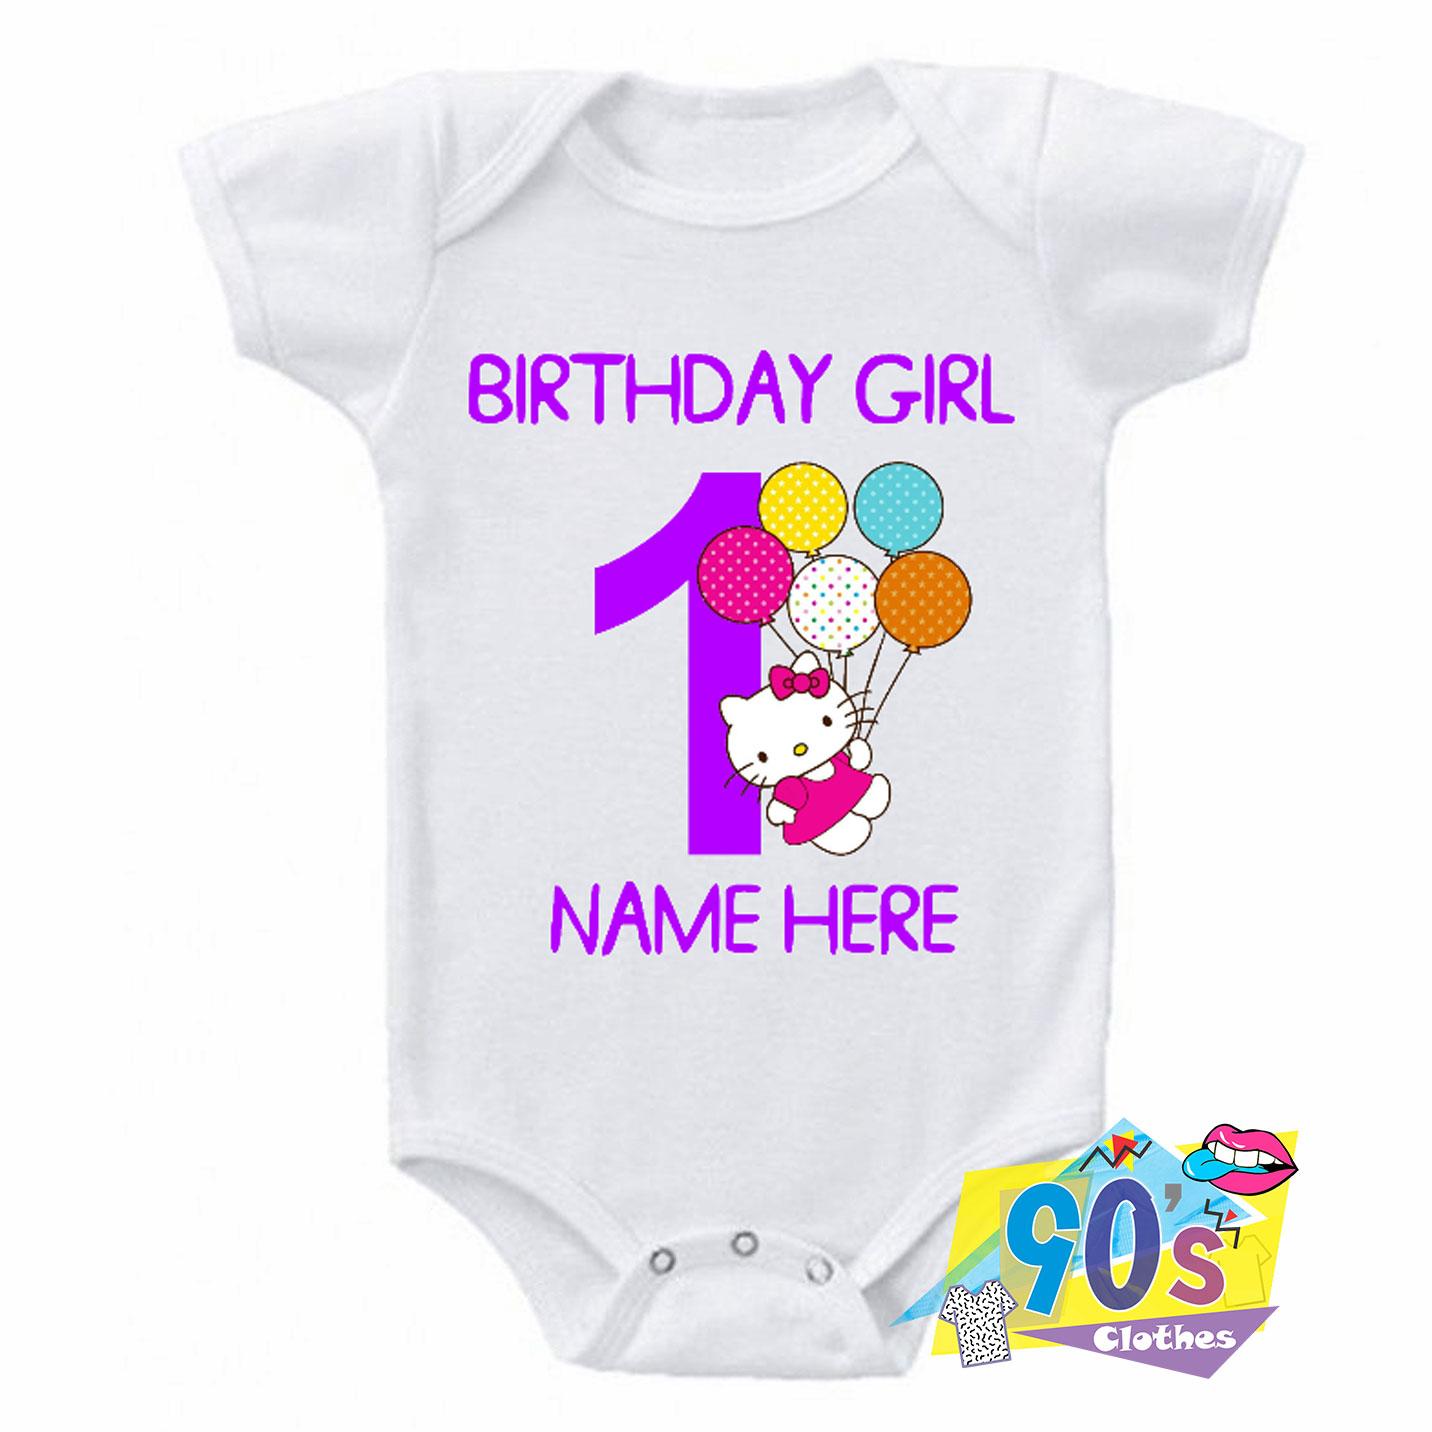 Birthday Girl Baby Onesie